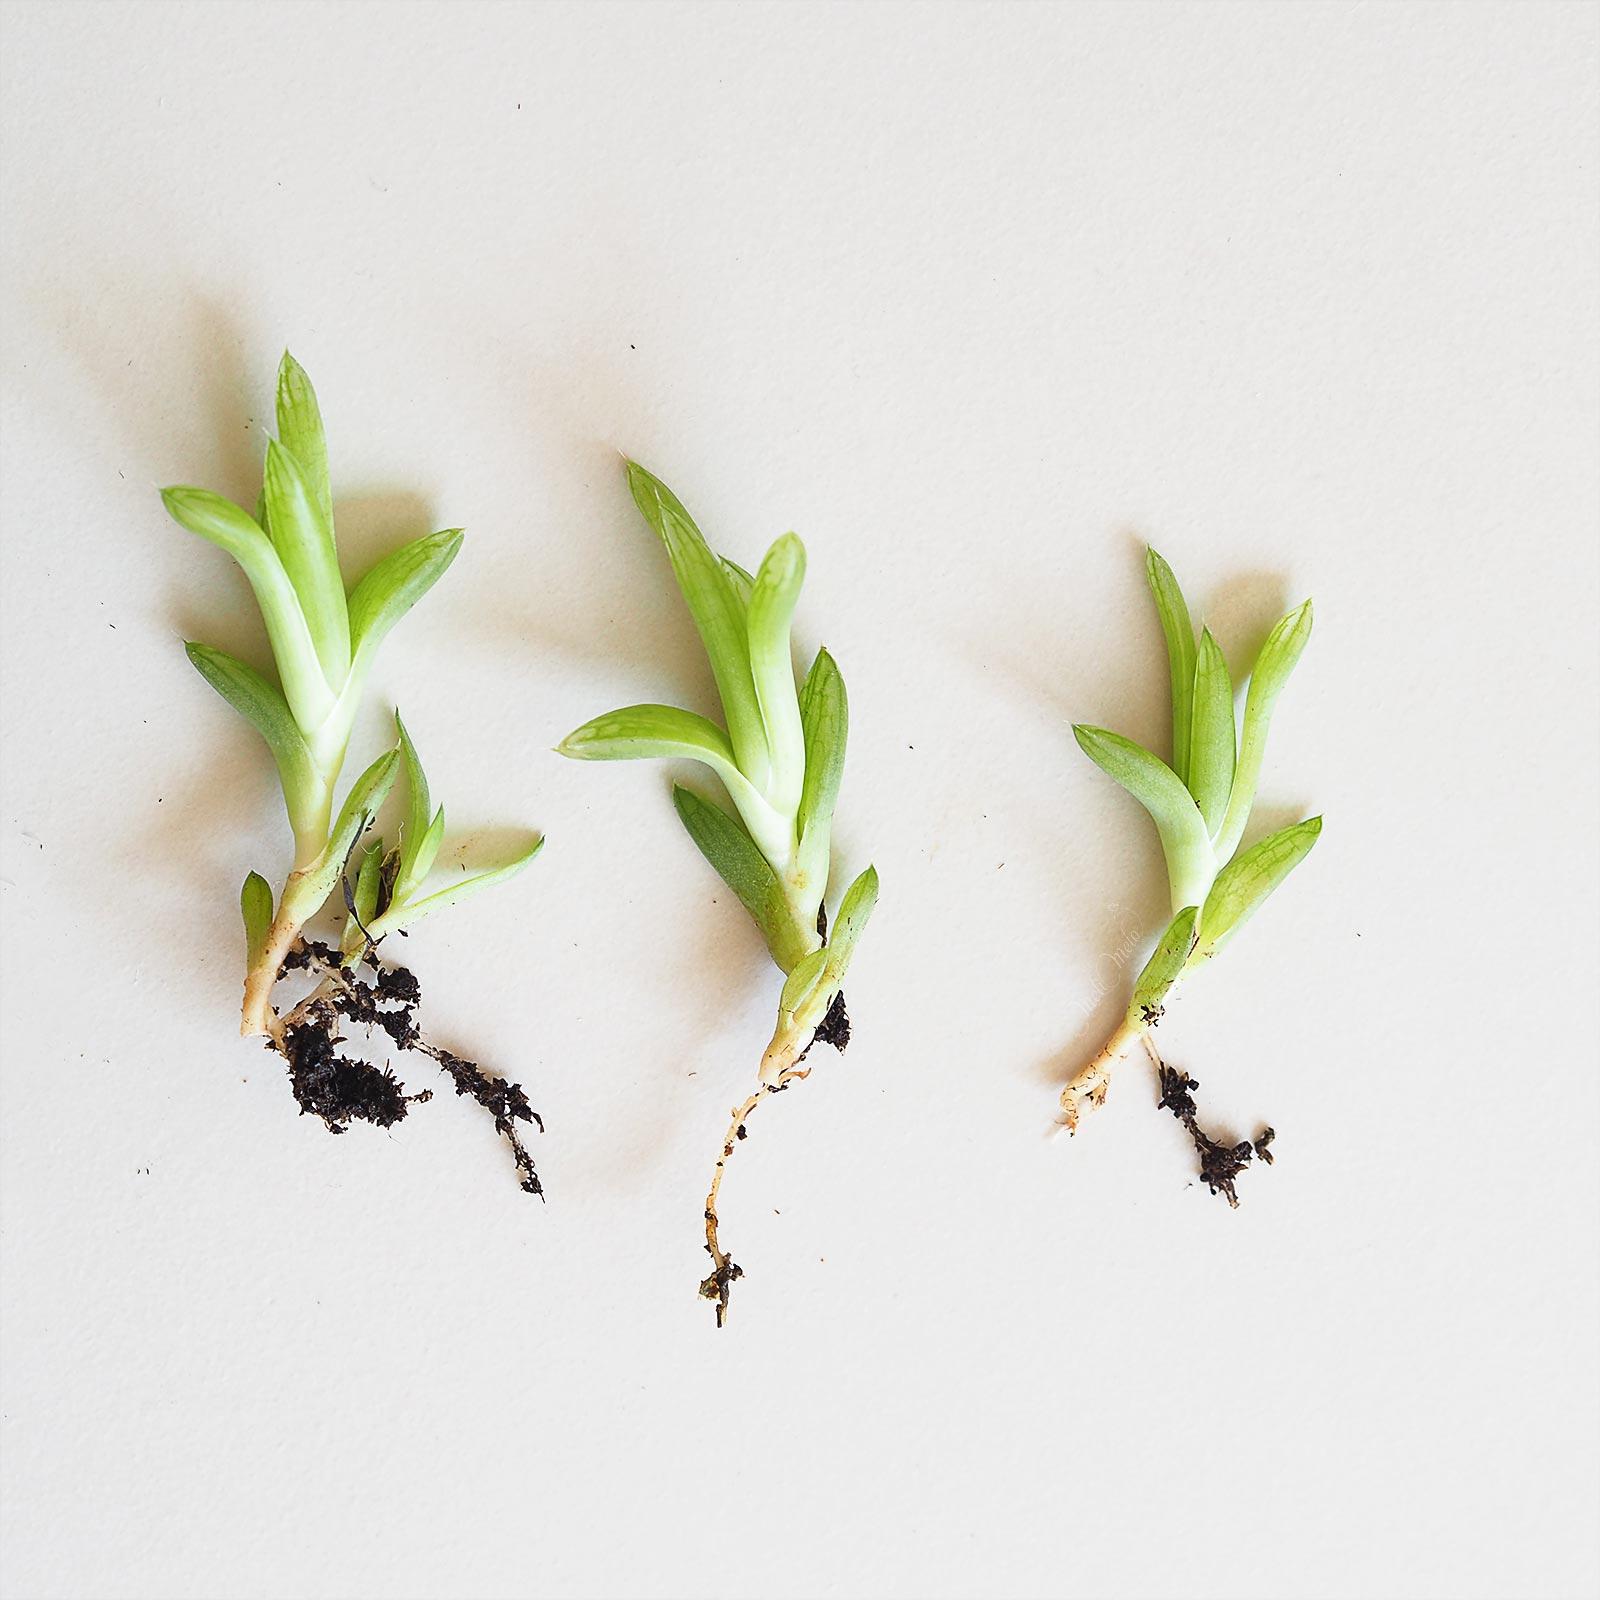 bouturage rejets racines succulente Haworthia Cymbiformis La Boutique de MeliMelo